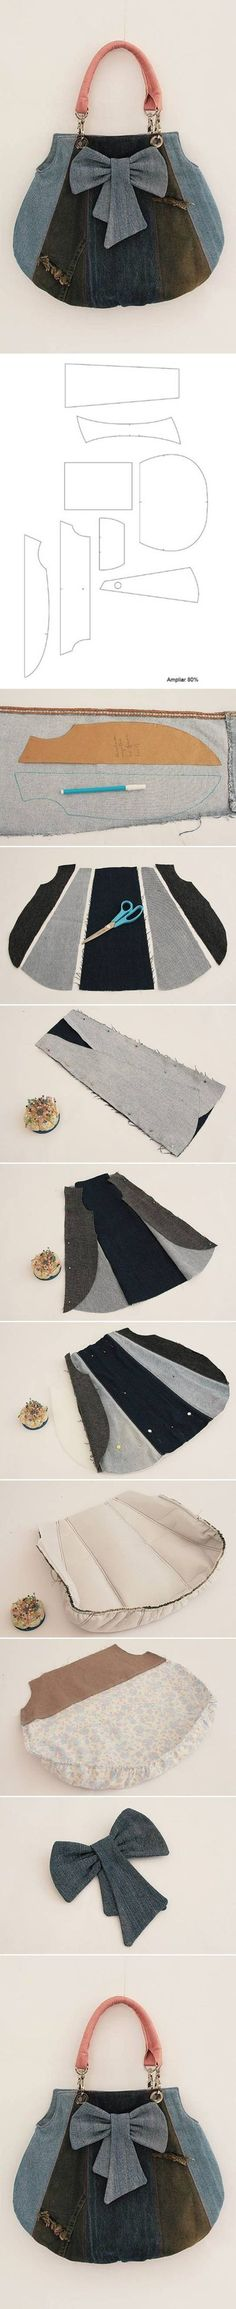 Vieux jeans de mode Sac Projets de bricolage bricolage | UsefulDIY.com